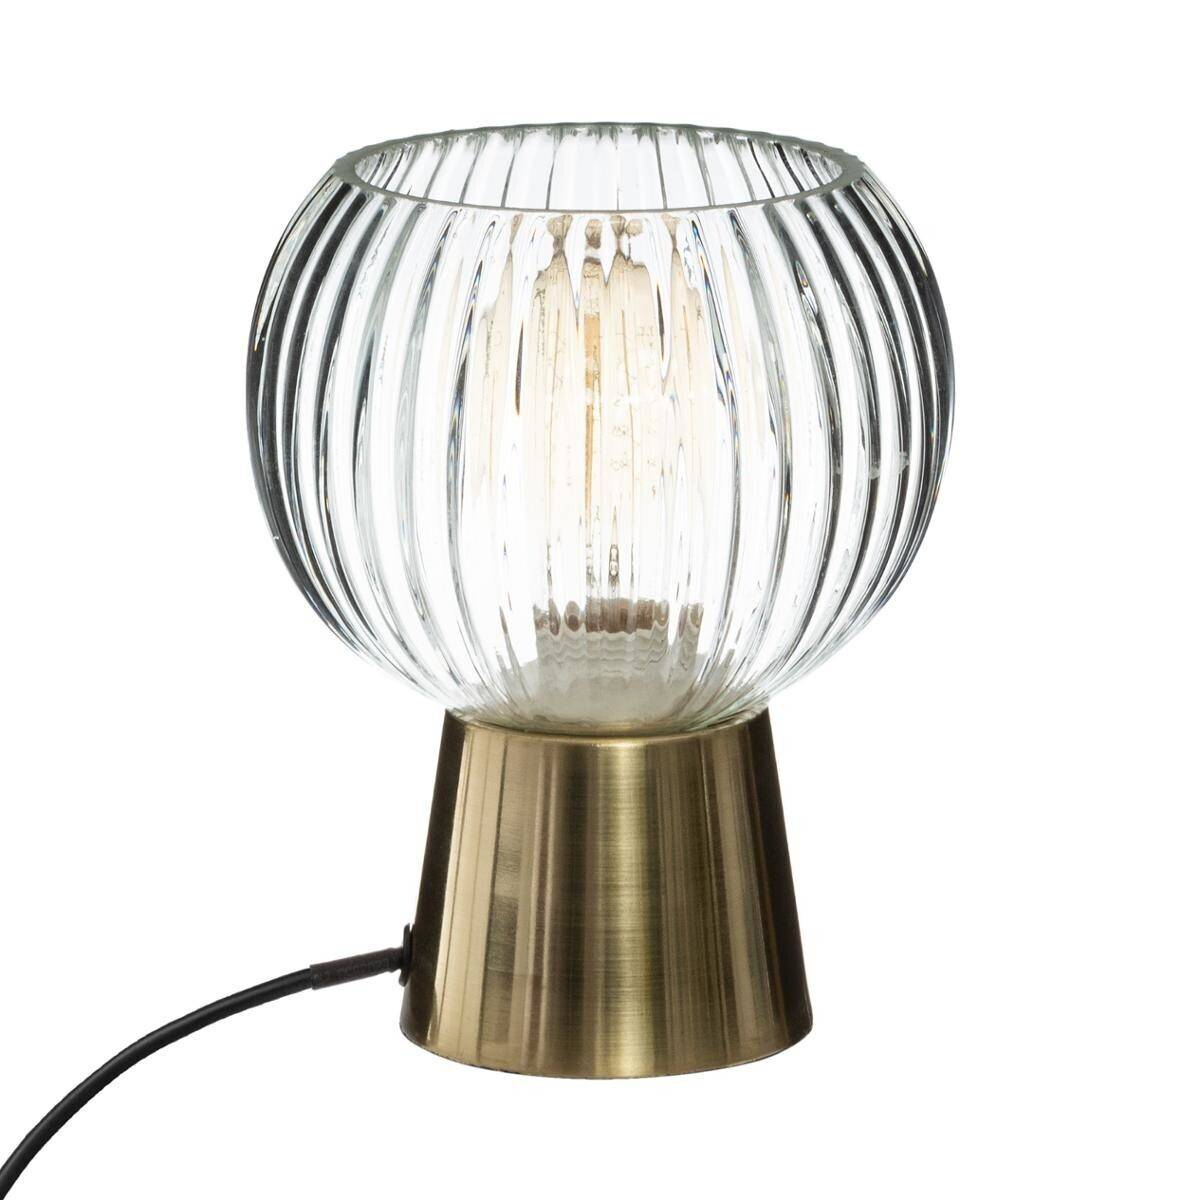 "Atmosphera Lampe transparente ""Laye"" en verre H19"